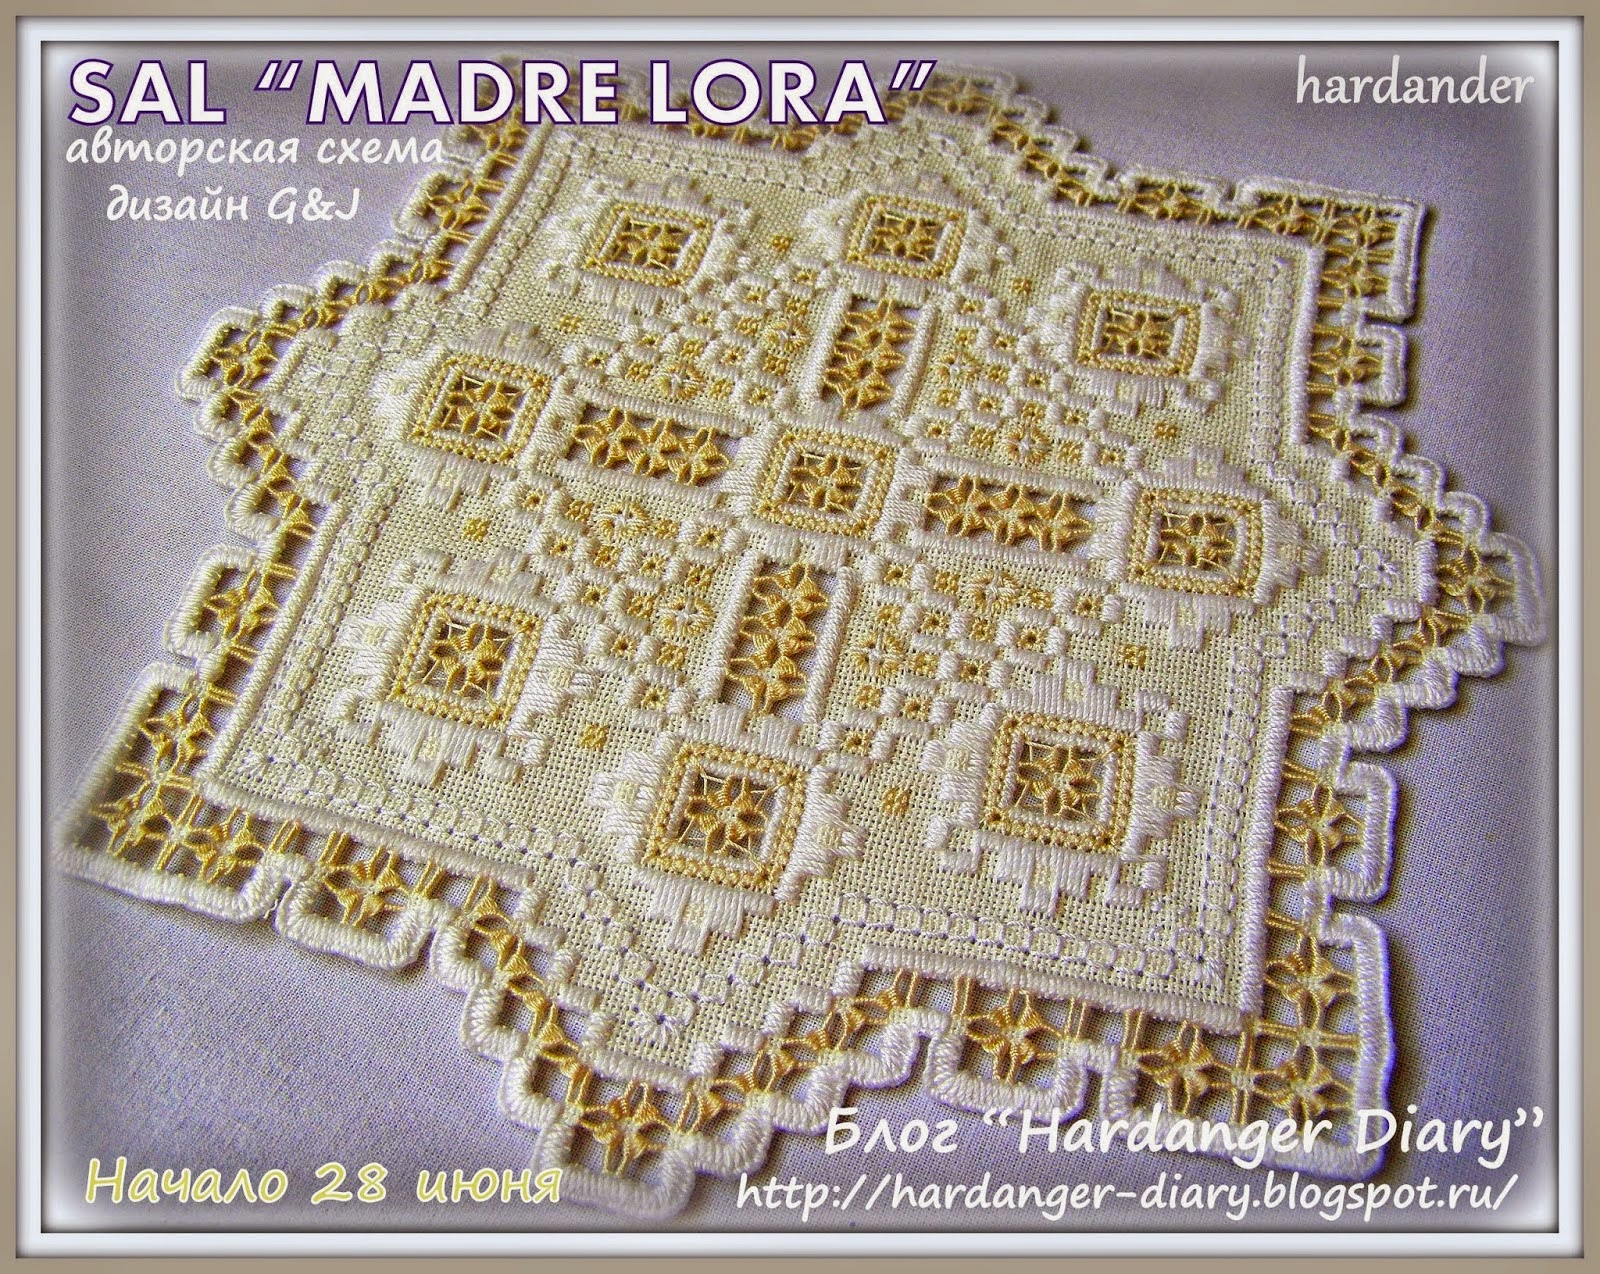 SAL MADRE LORA